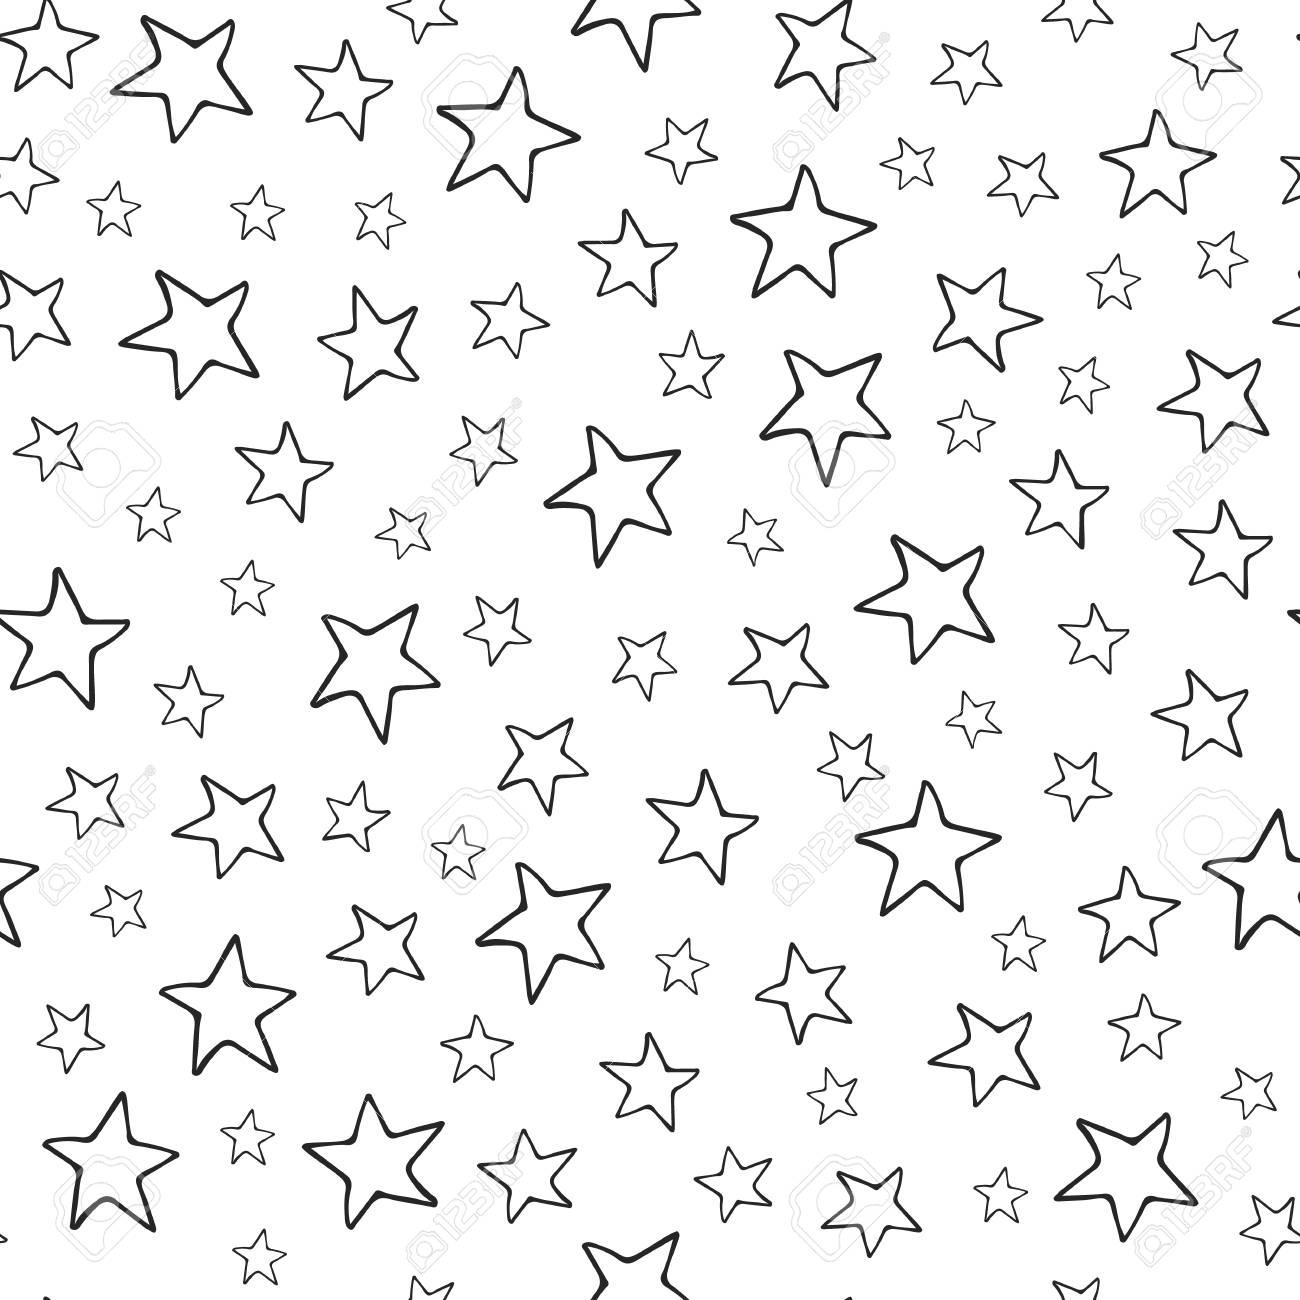 Stars seamless pattern black hand drawn stars on white background